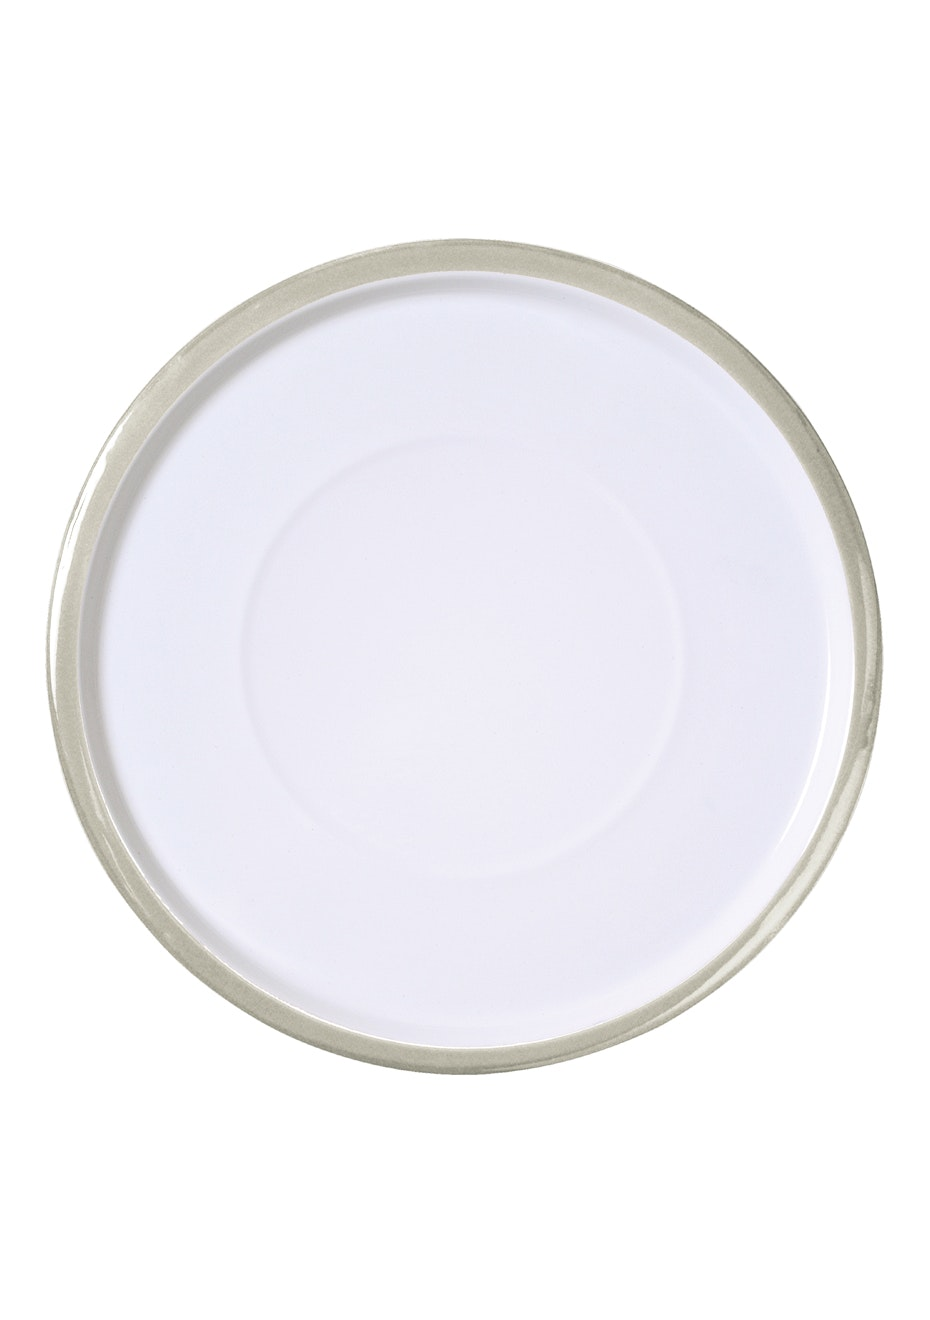 Città - Variopinte Enamel Large Plate Sand 31cmdia